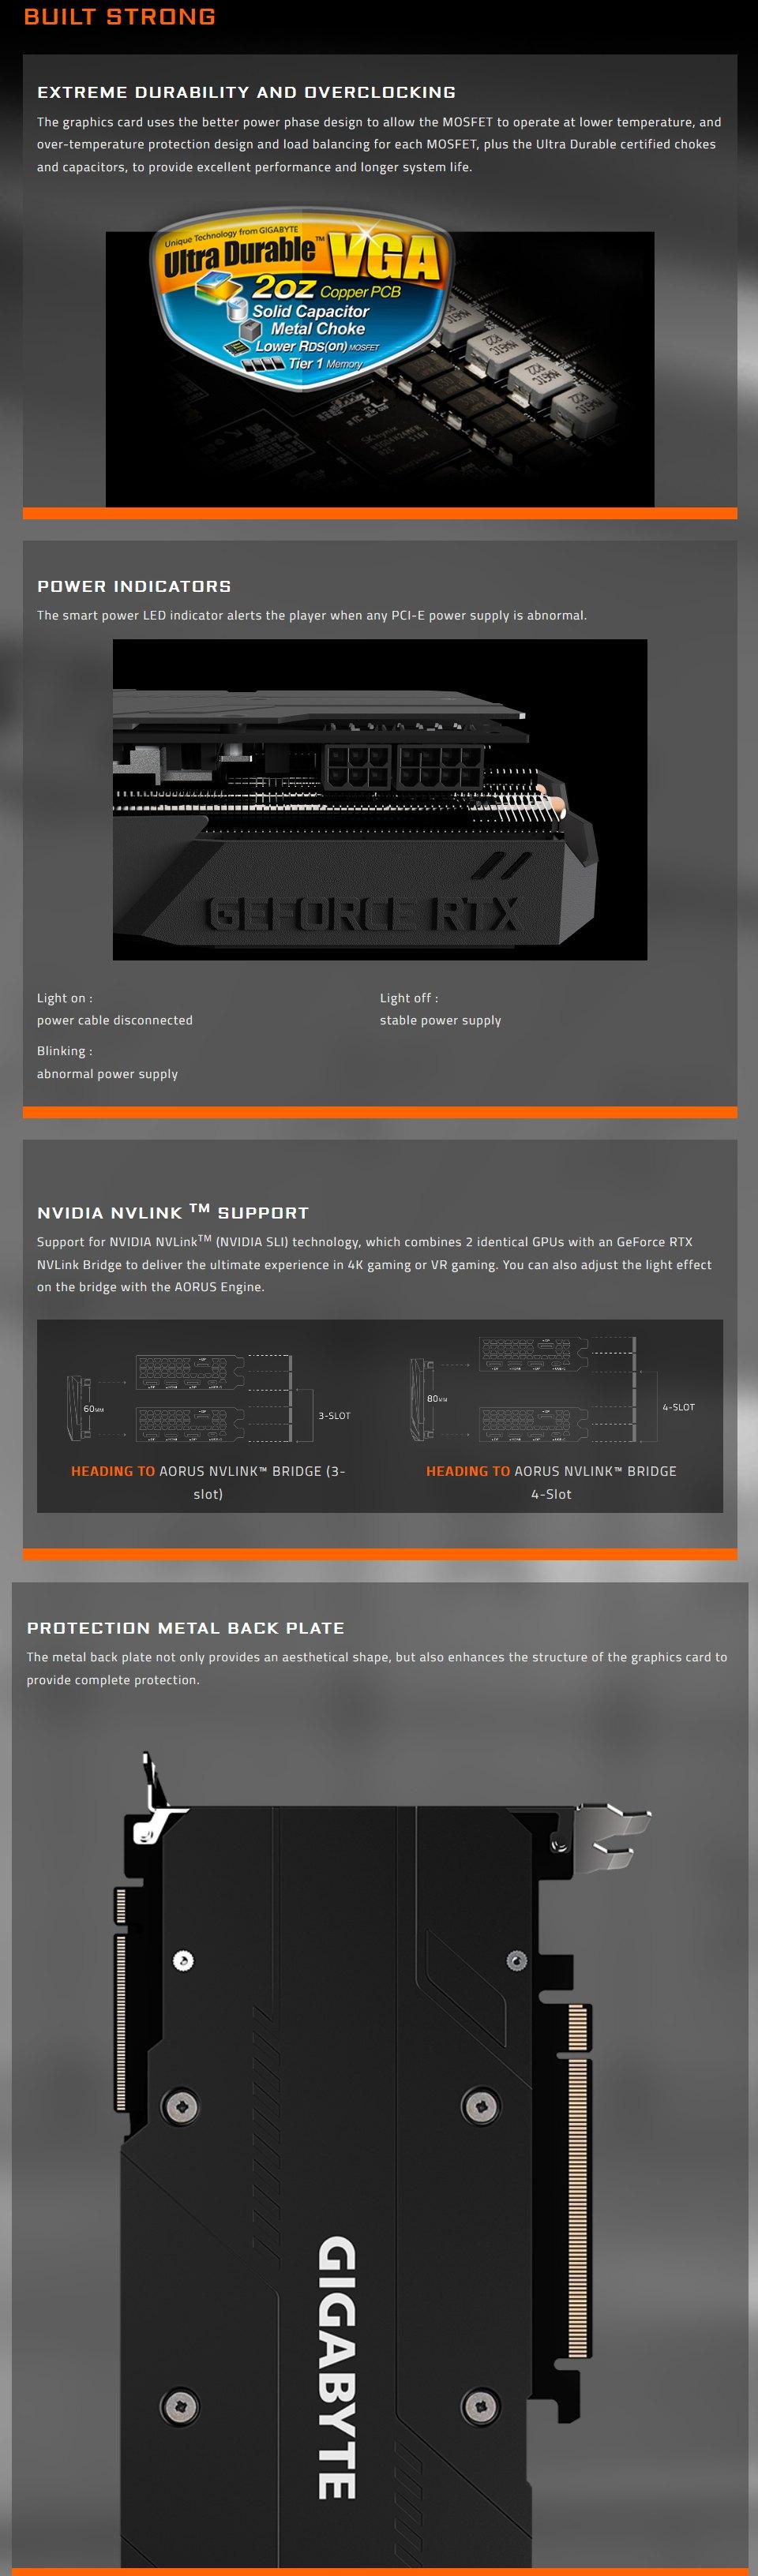 Gigabyte GeForce RTX 2080 Super Gaming OC 8GB Rev 2.0 features 4